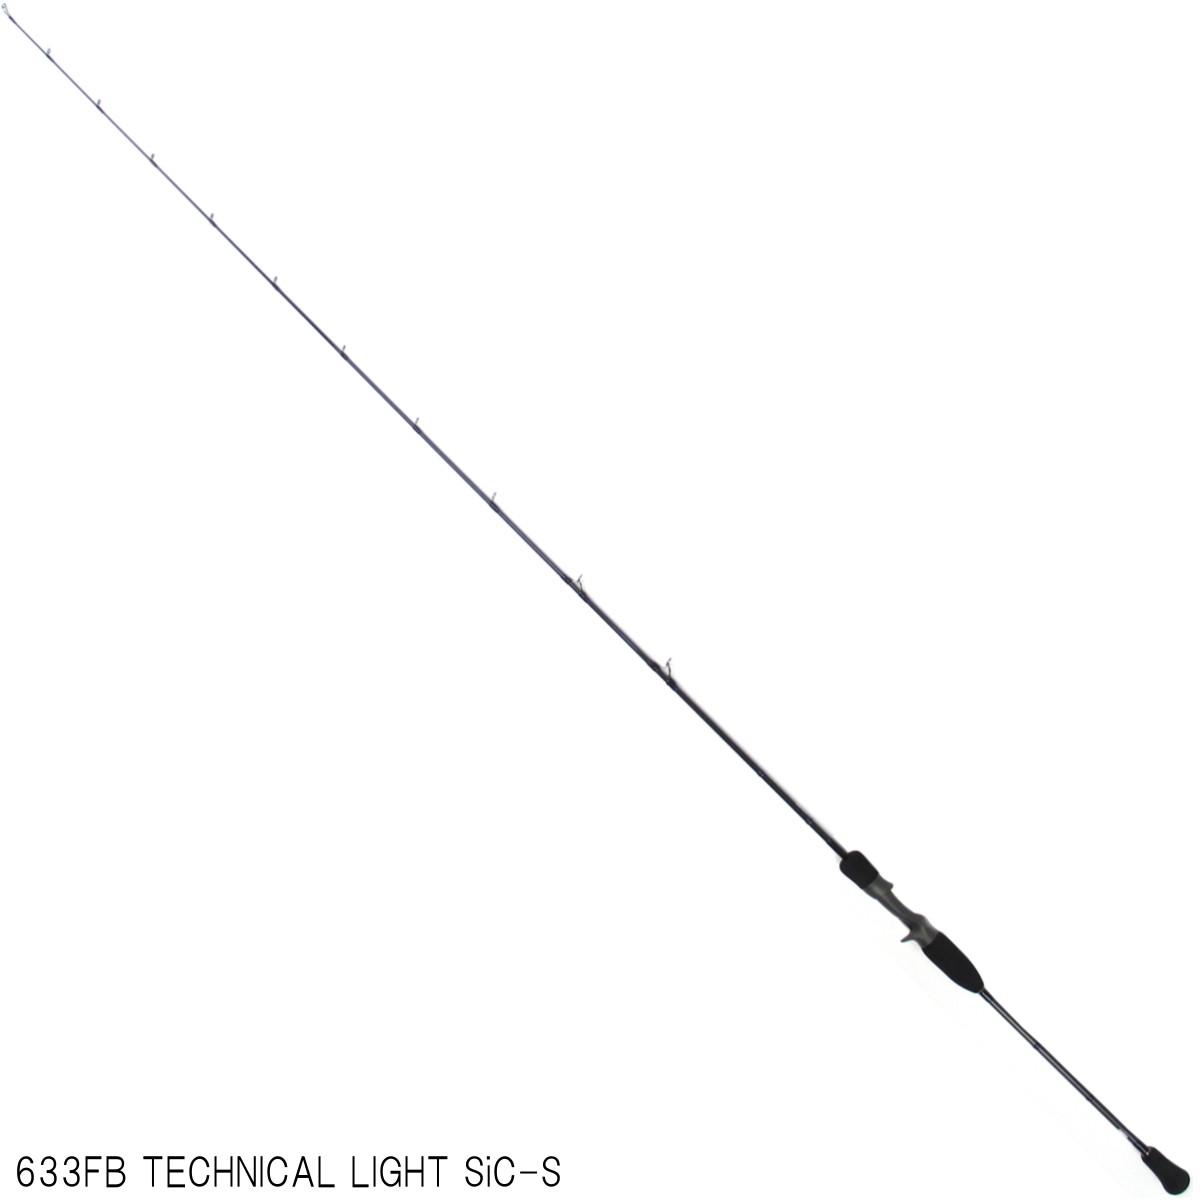 SSR Flex 633FB TECHNICAL LIGHT SiC-S【大型商品】